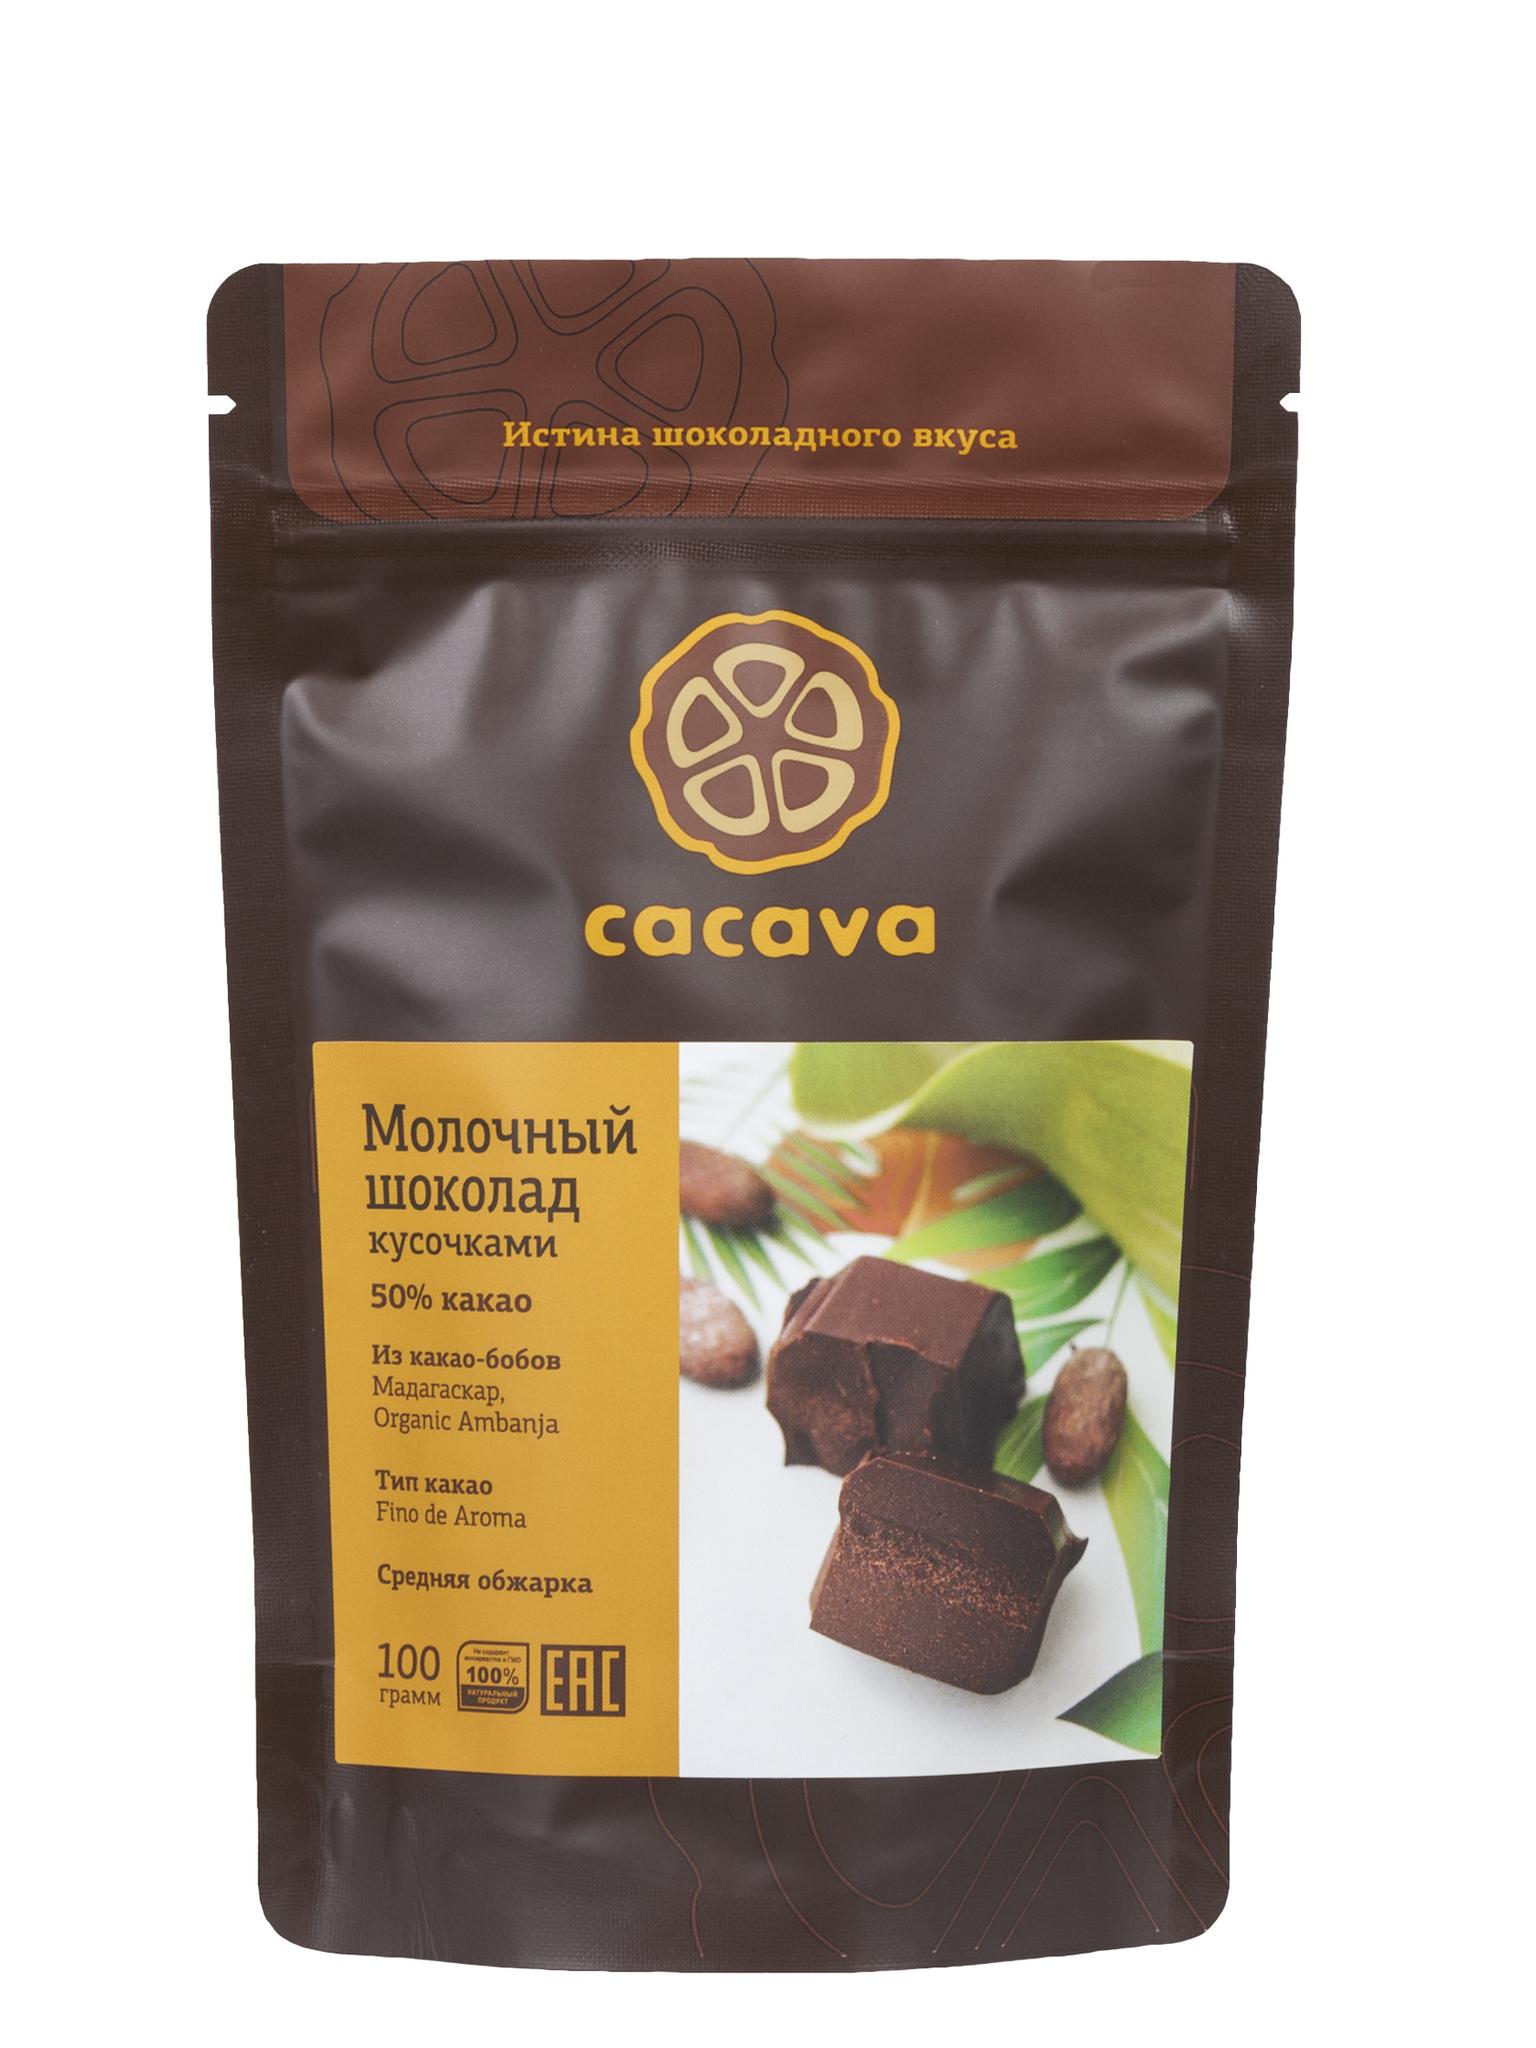 Молочный шоколад 50 % какао (Мадагаскар), упаковка 100 грамм